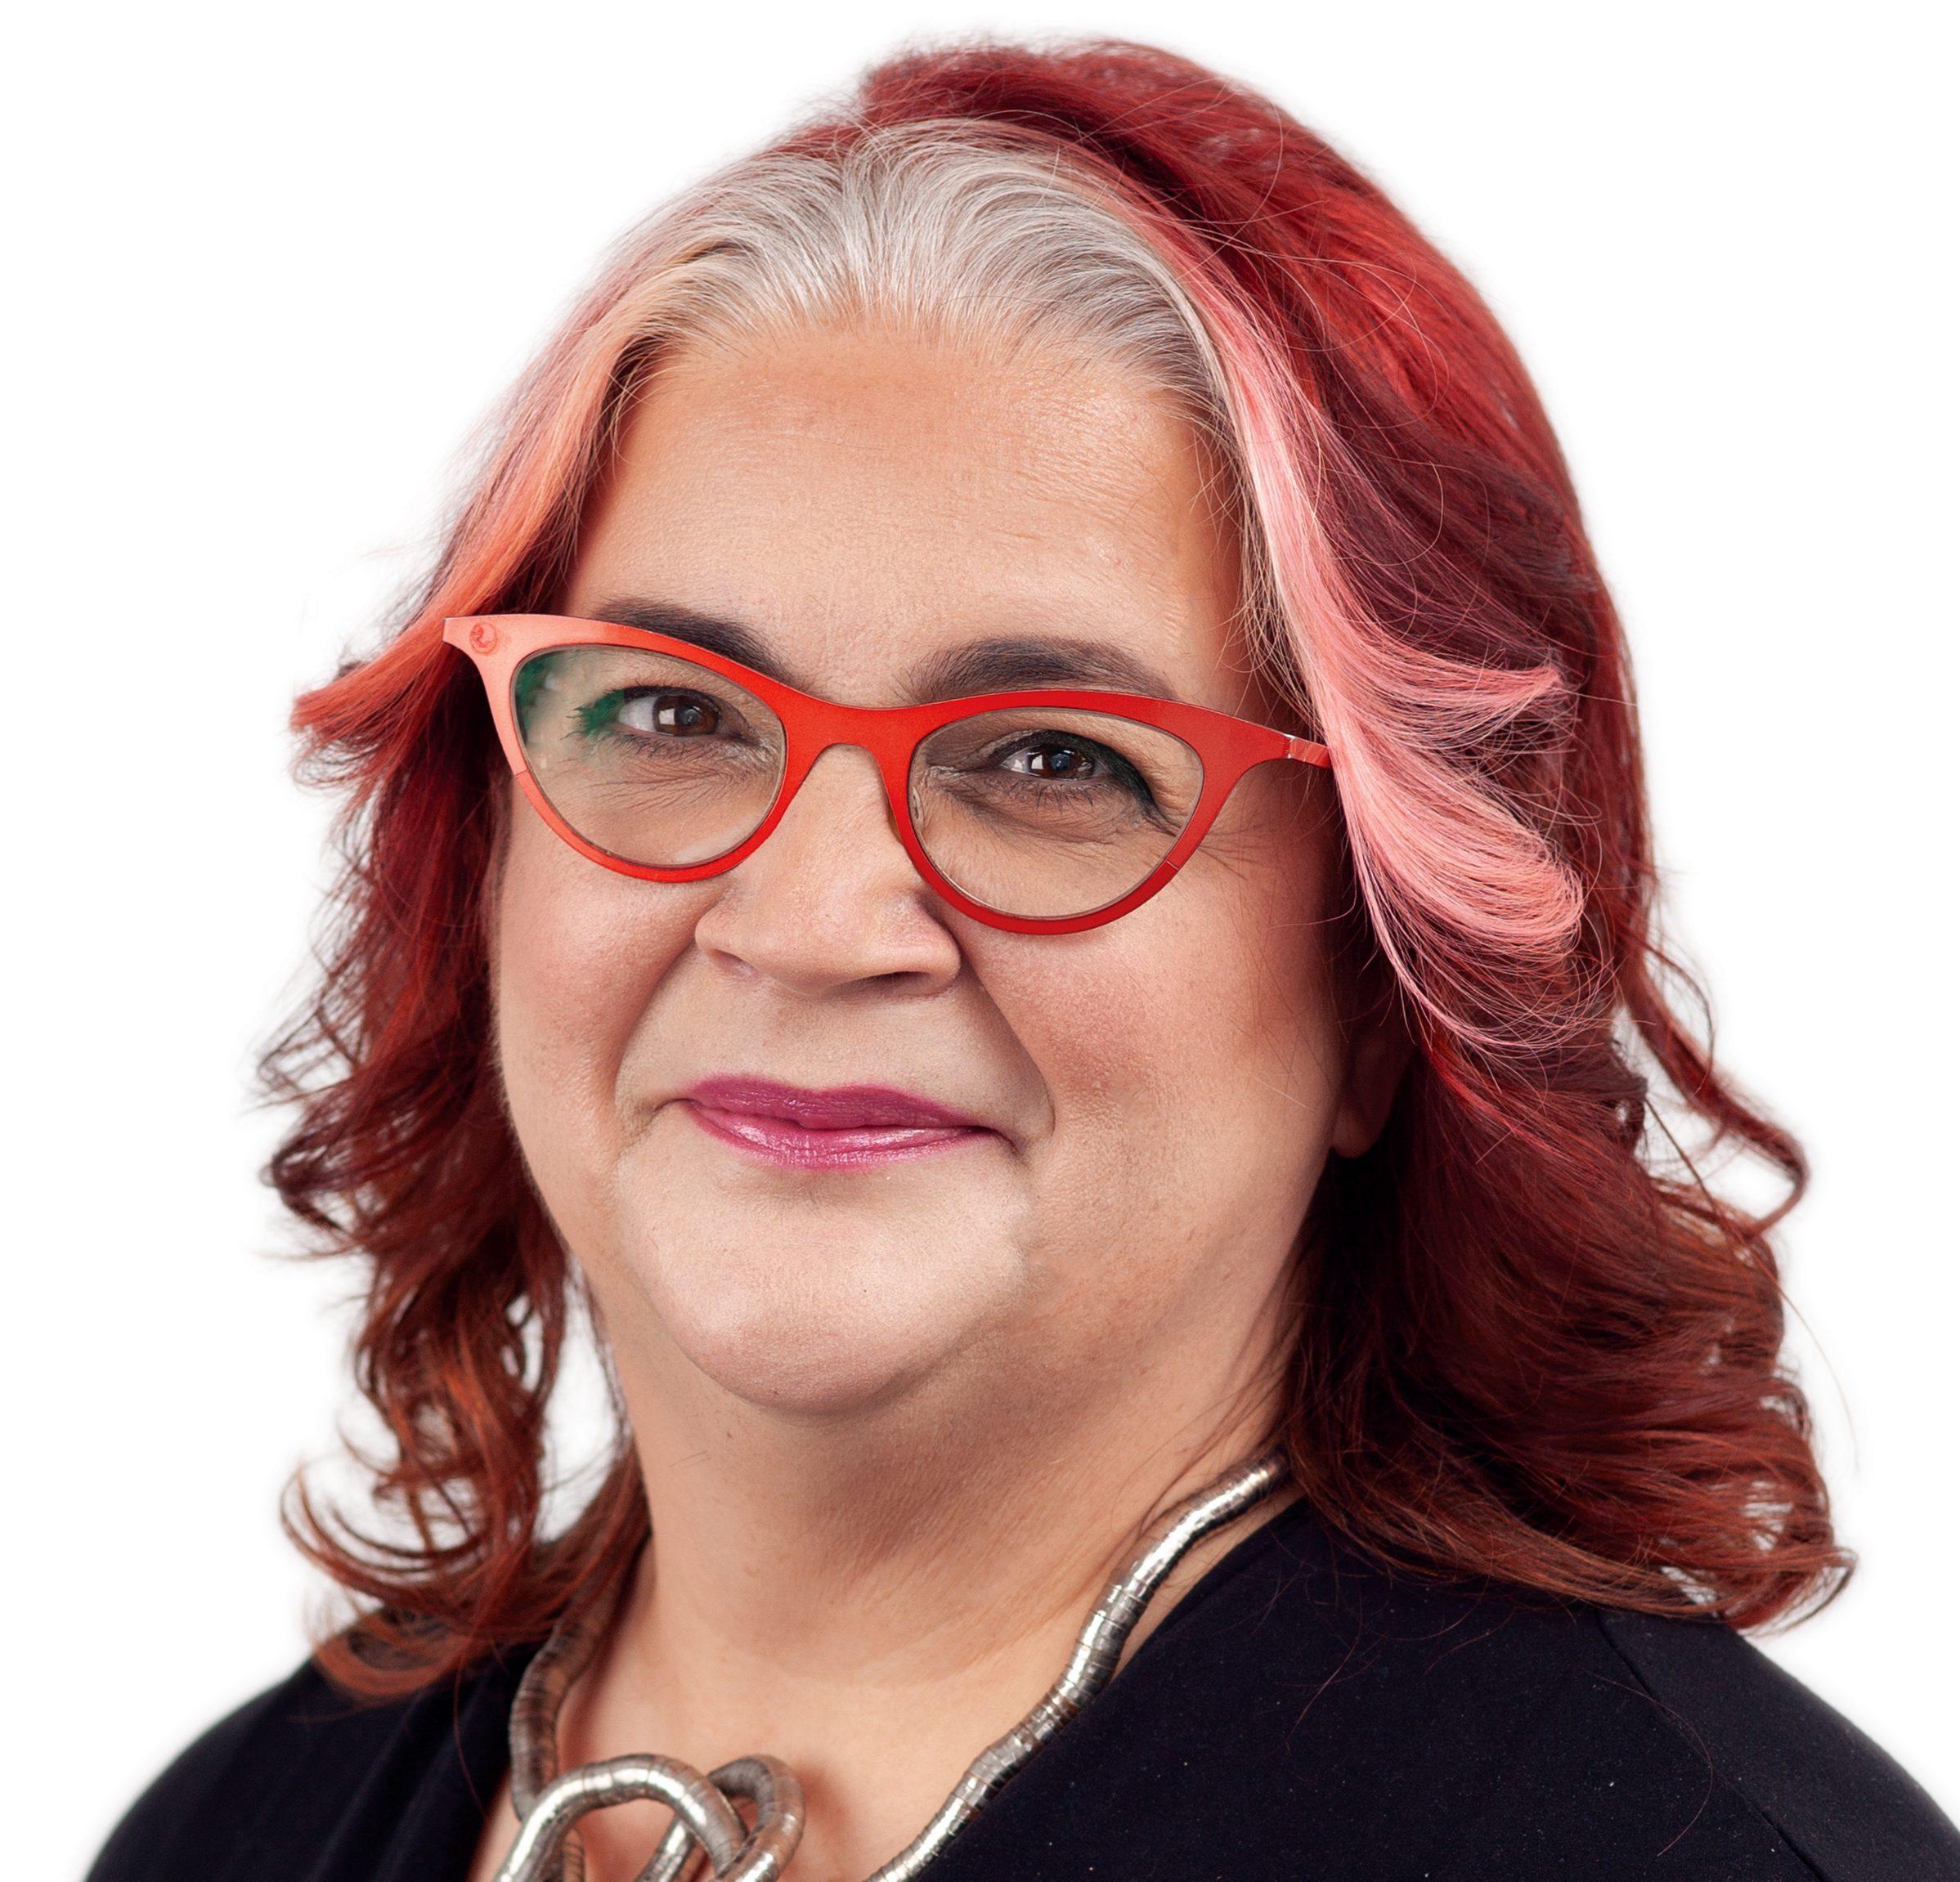 Vanessa LeBourdais